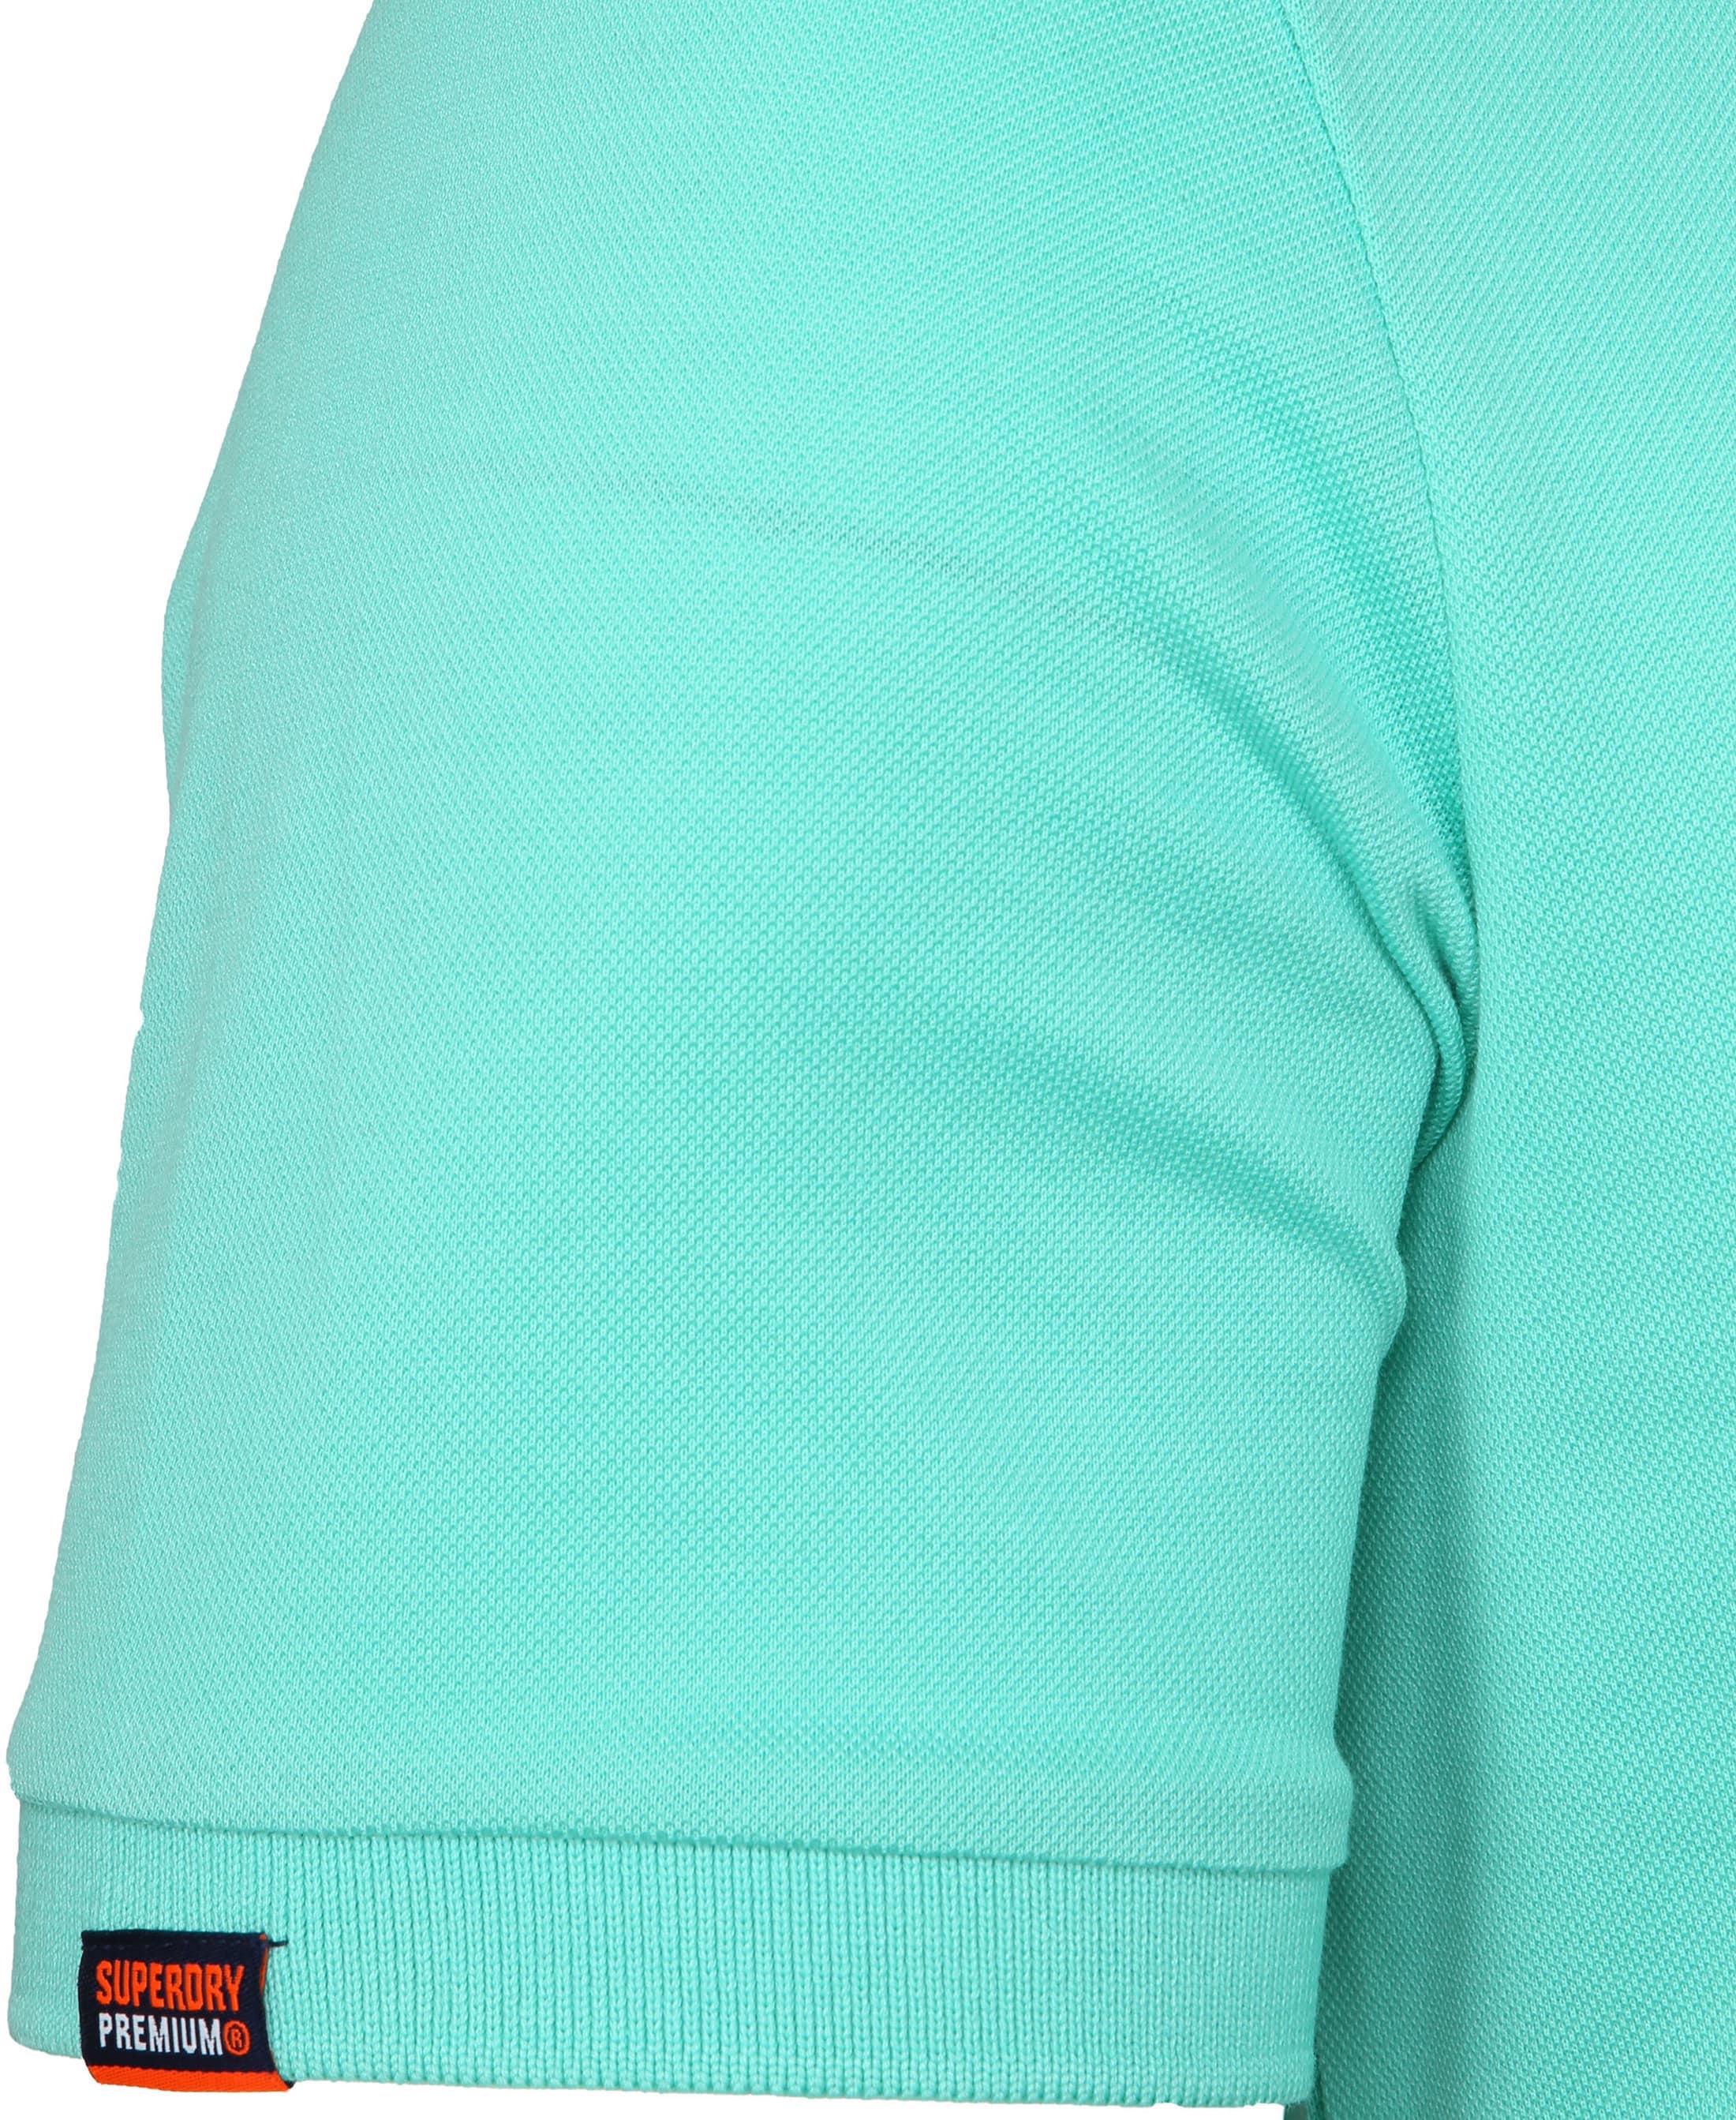 Superdry Poloshirt Premium Turquoise foto 4